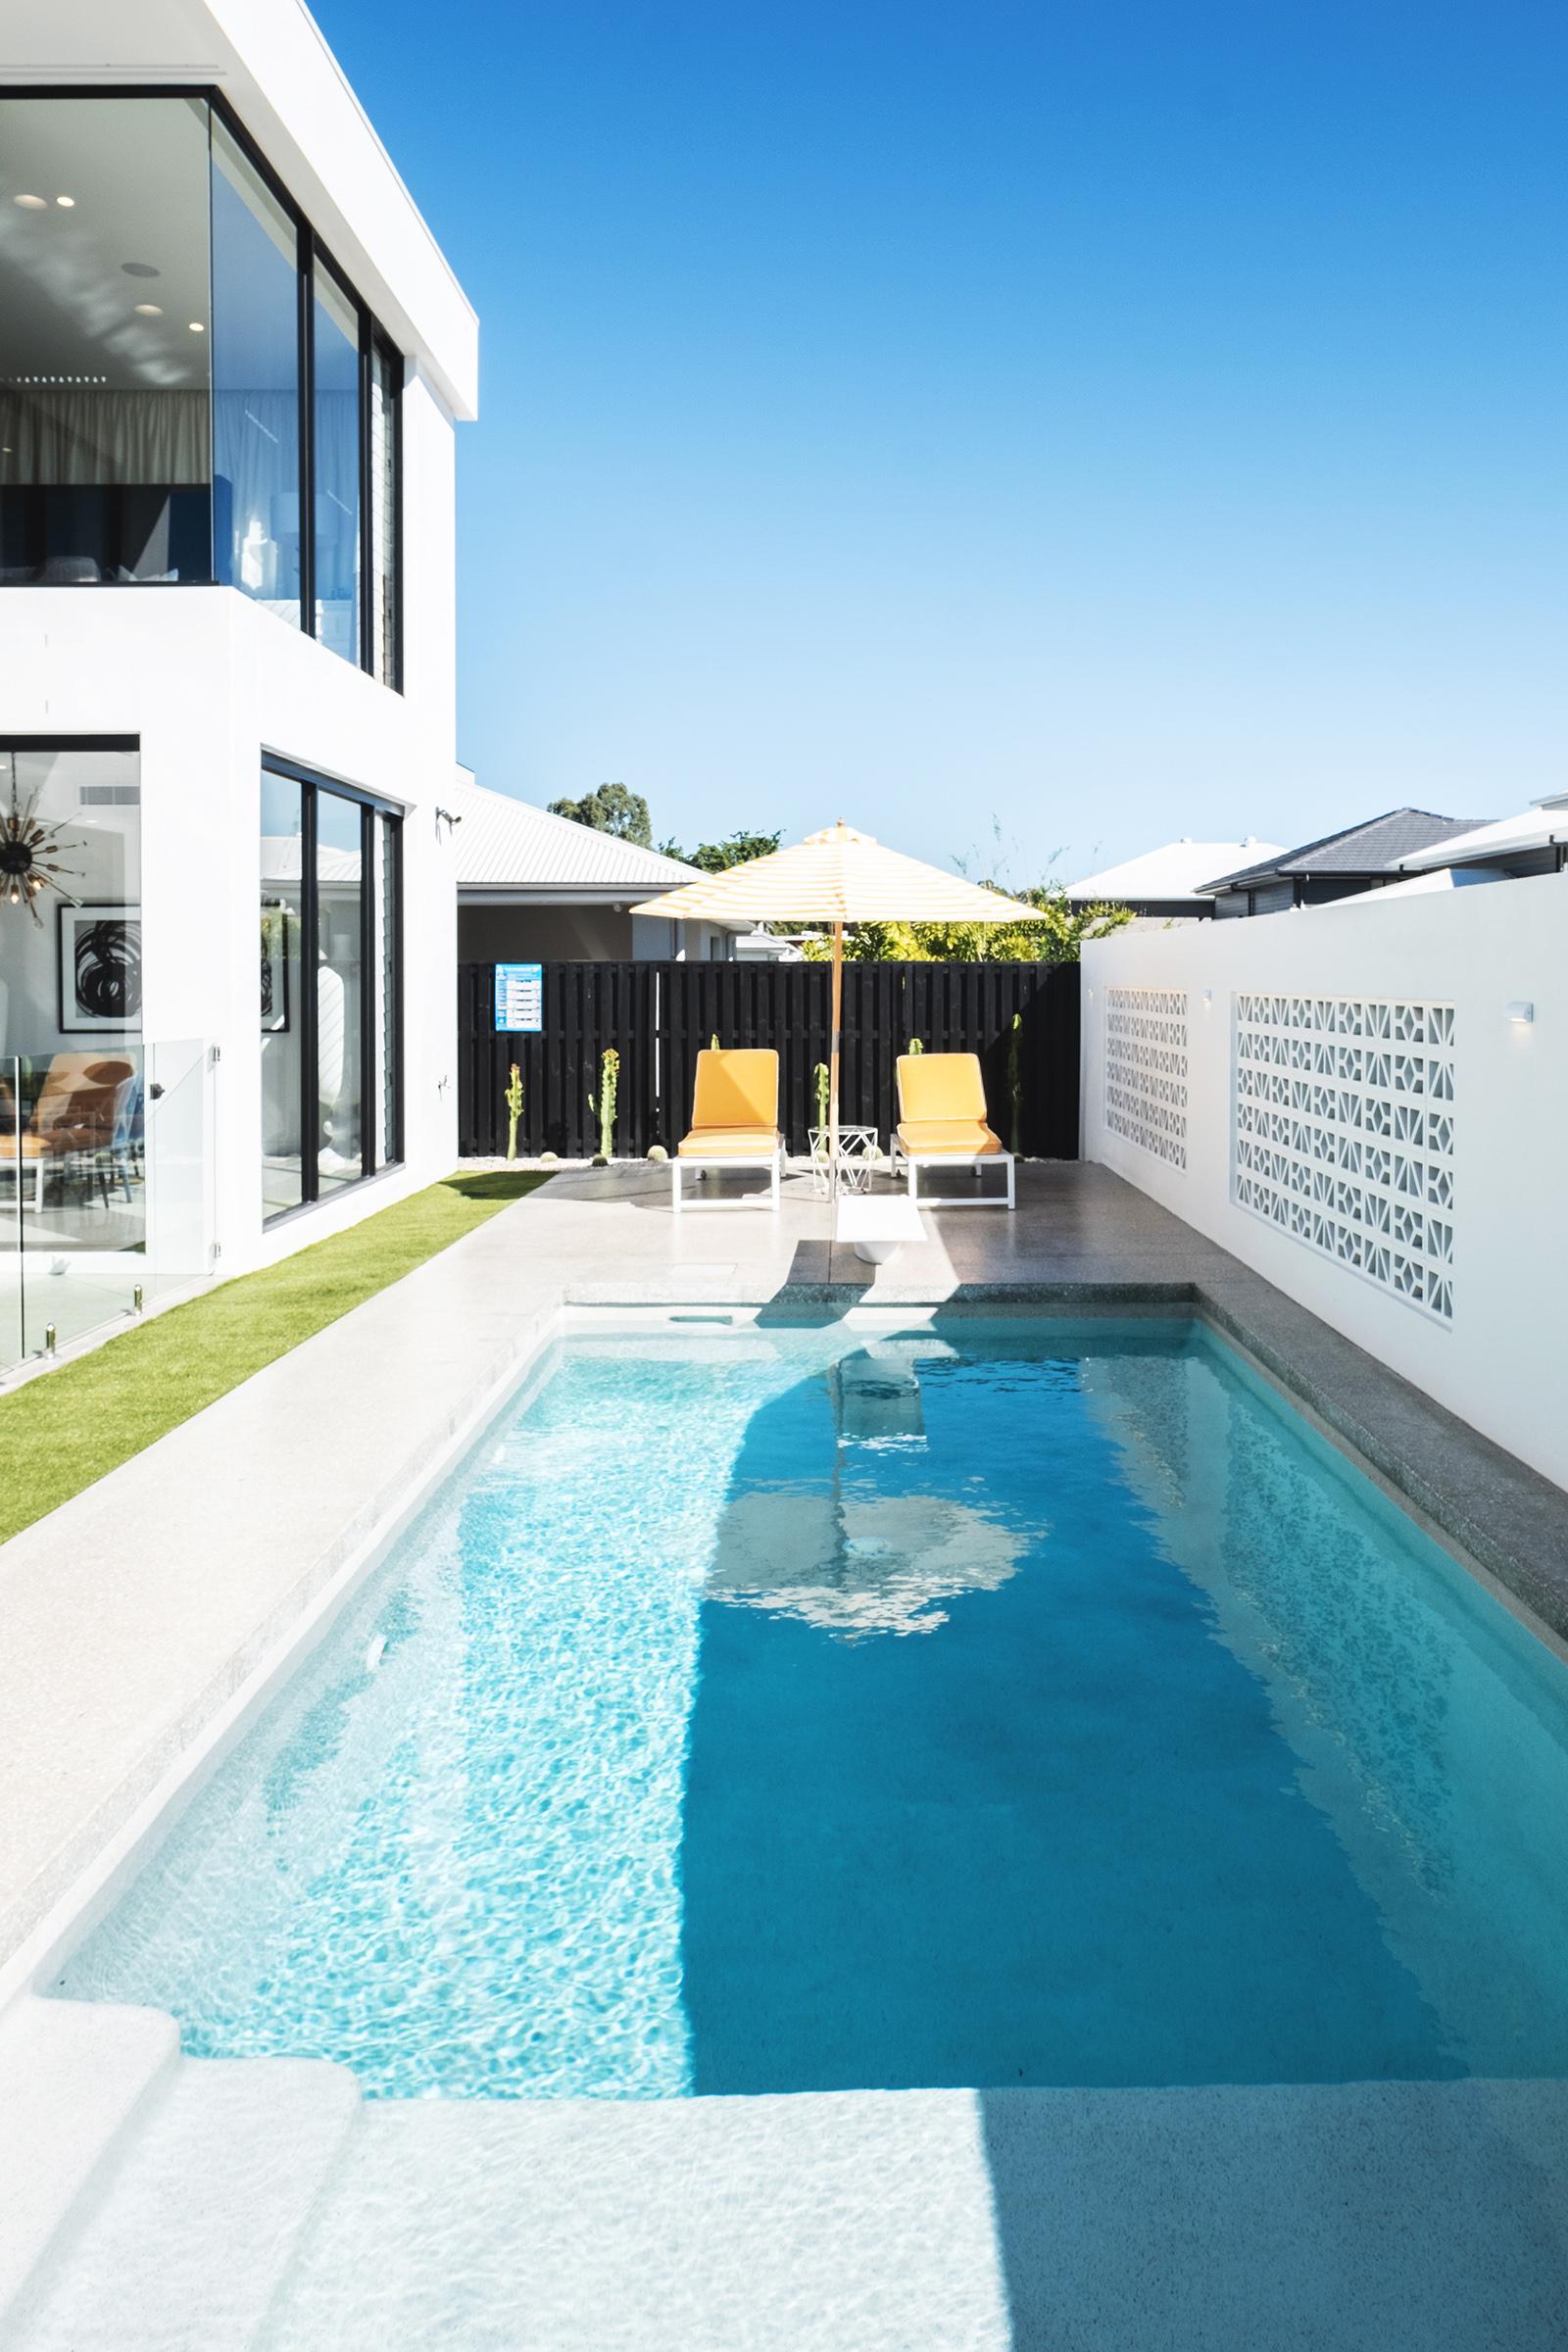 aston_milan_pool_outdoors_space_display_home_palm_springs_style_1.jpg